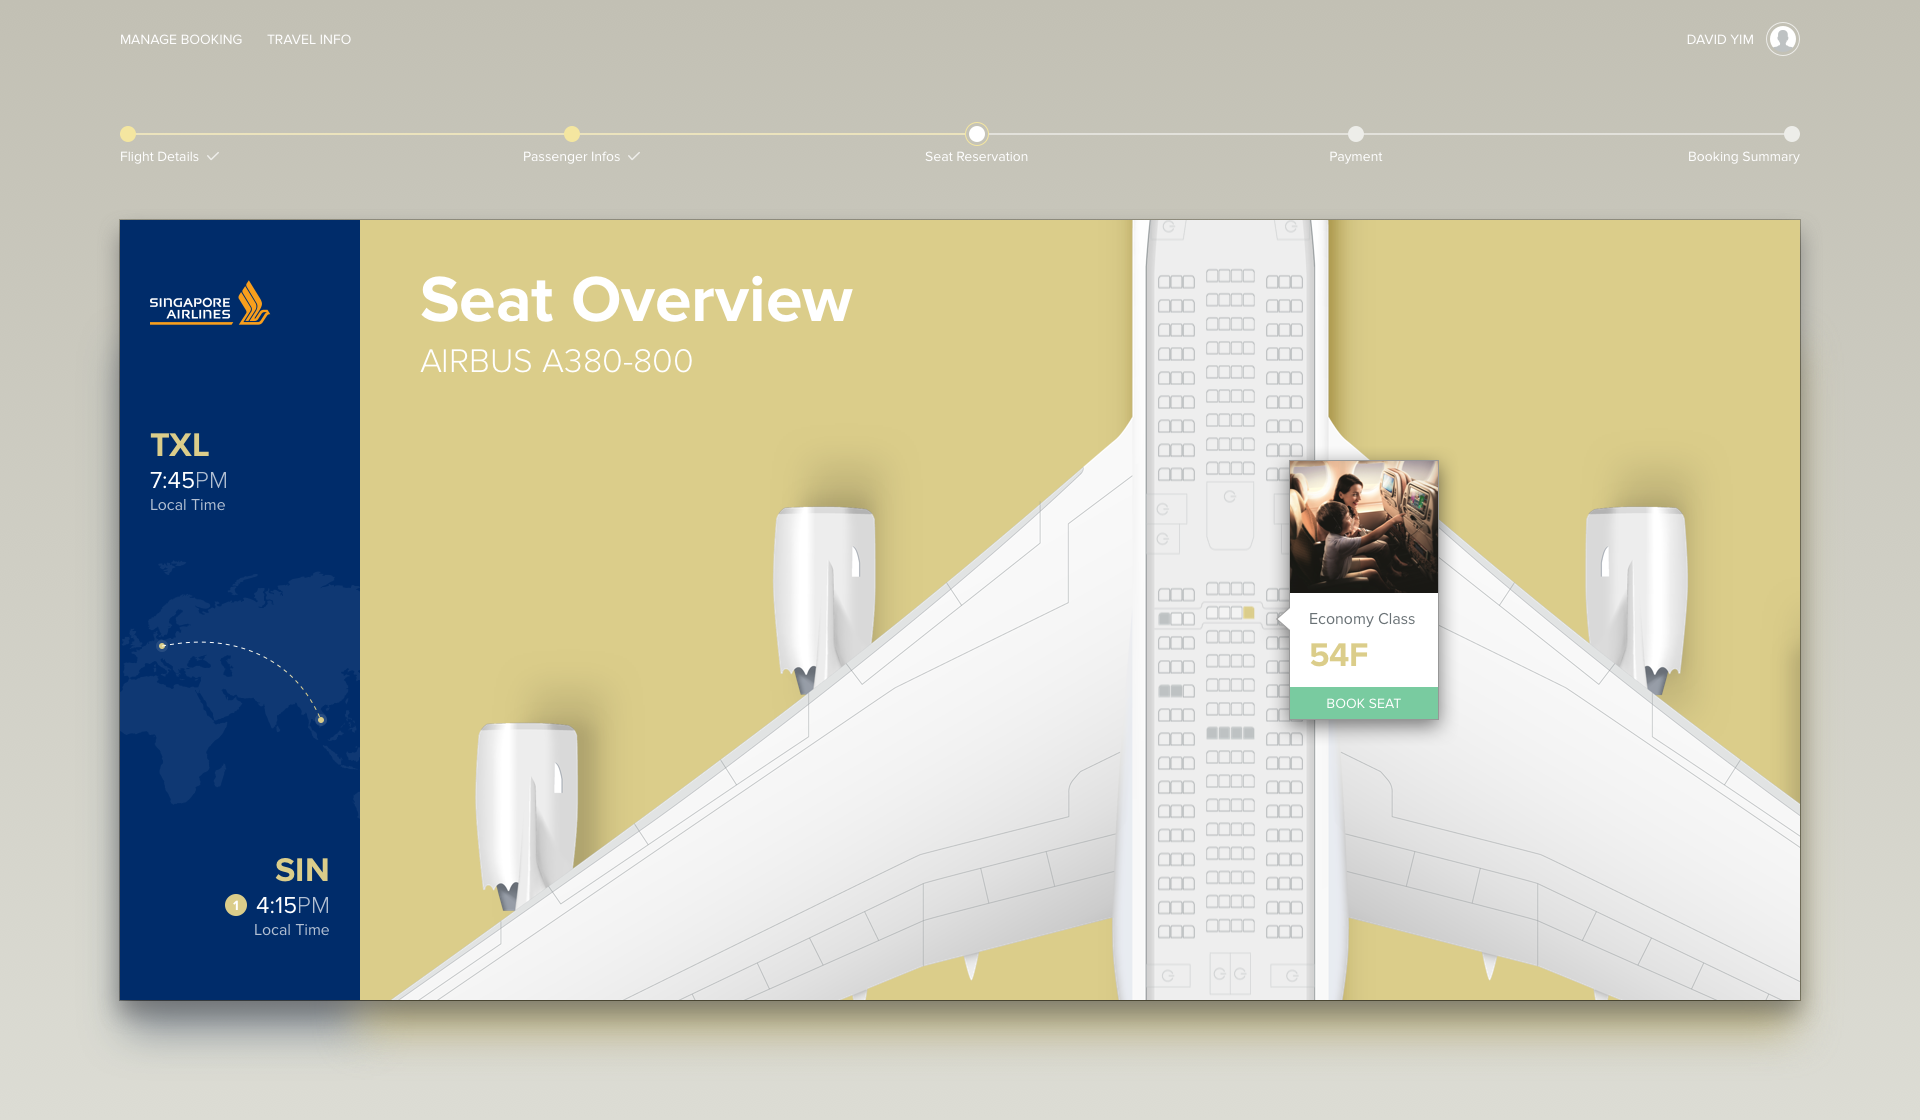 manage flight booking